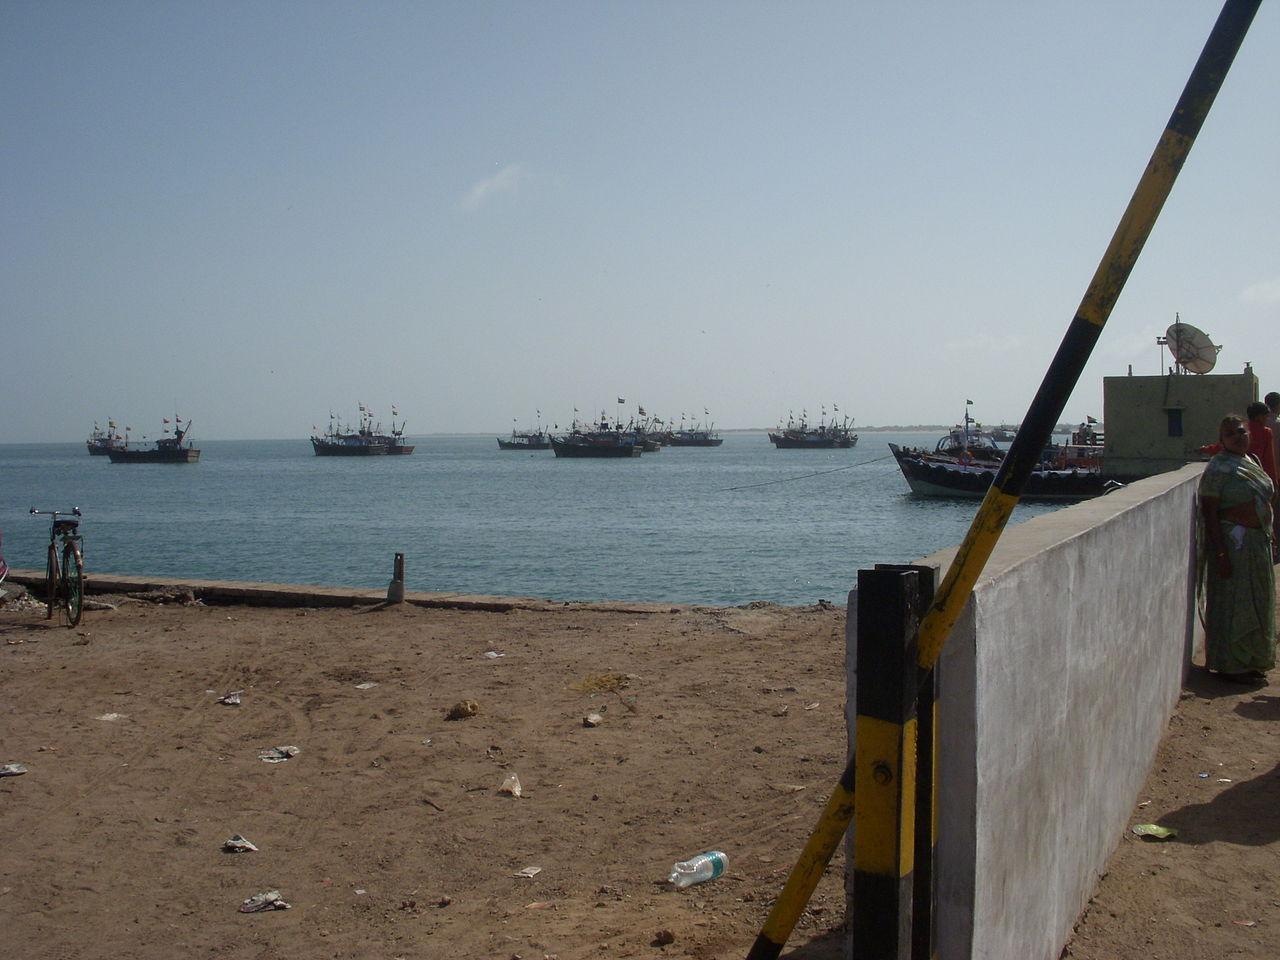 Bet Dwarka Beach Experience-Fishing Boats On The Island